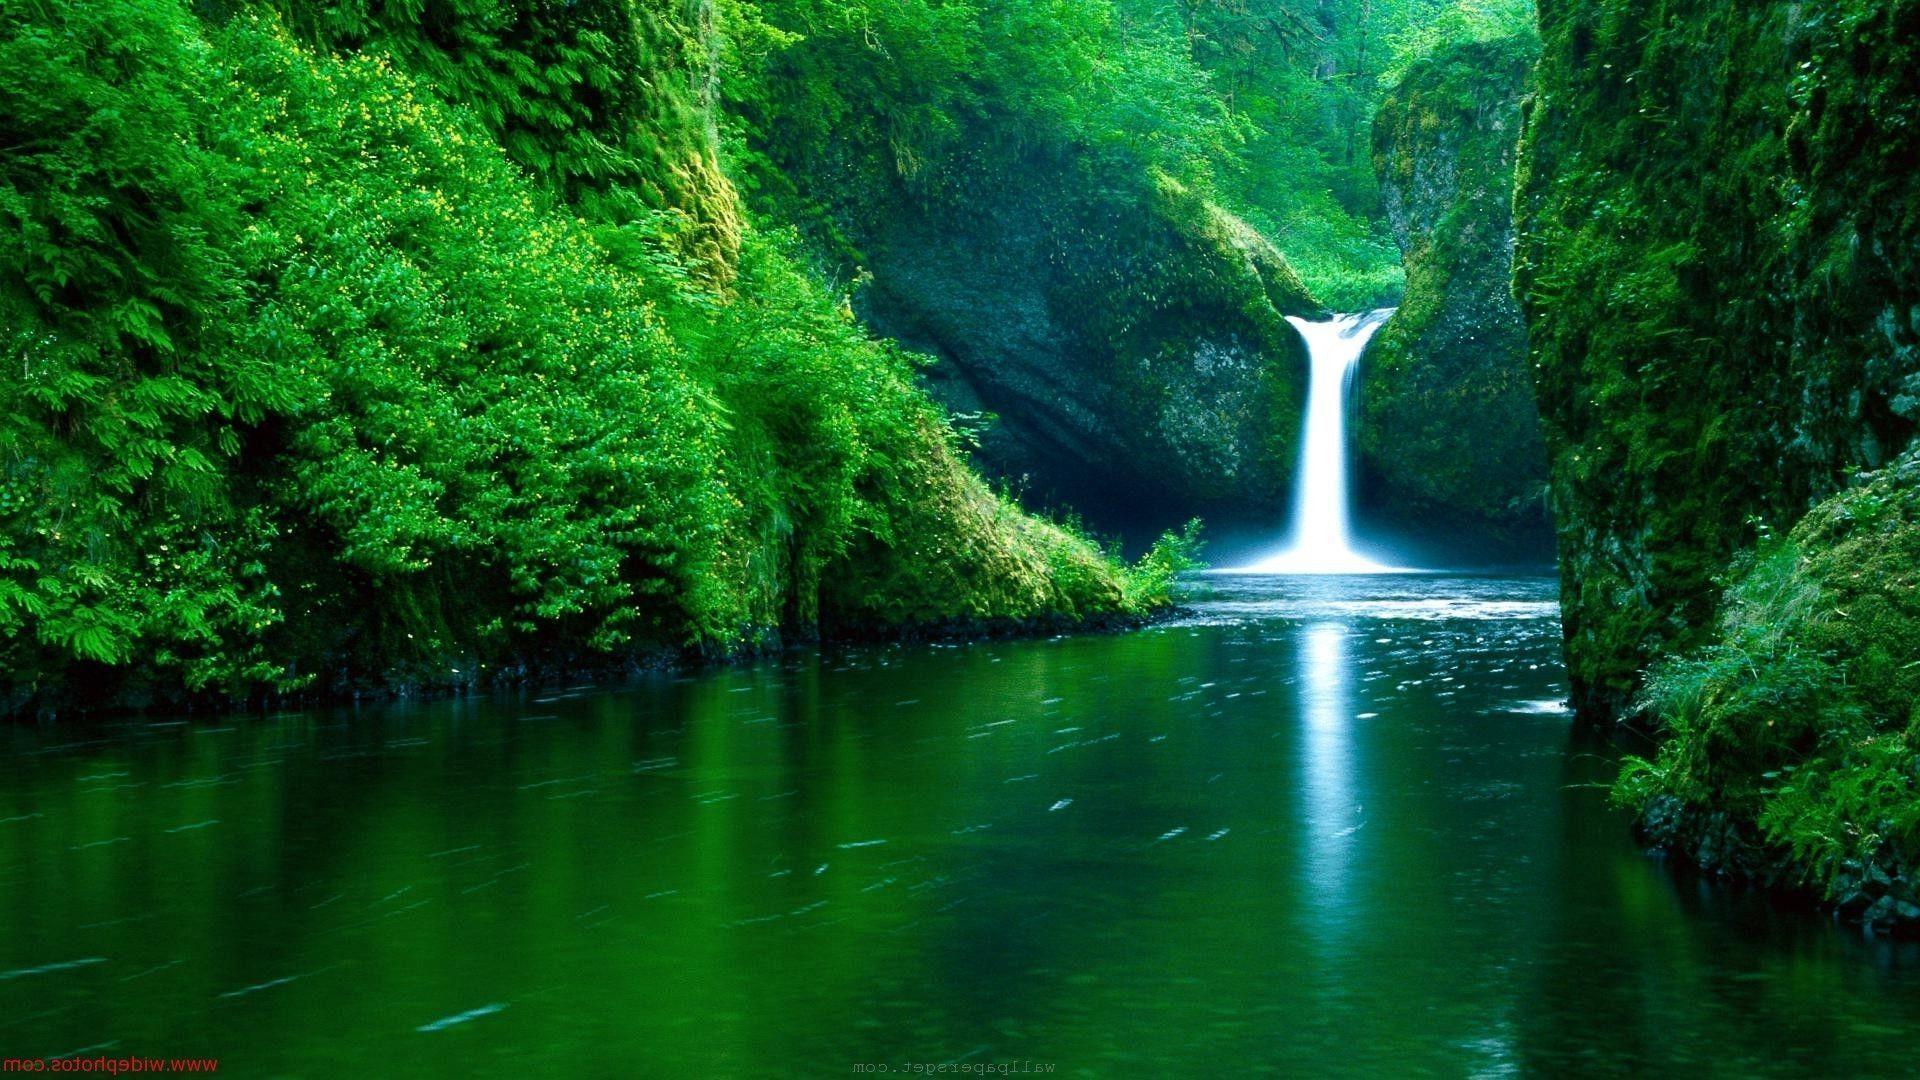 Hd wallpaper nature green - Beautiful Nature Wallpaper Wallpaperu Hdwallpaperin